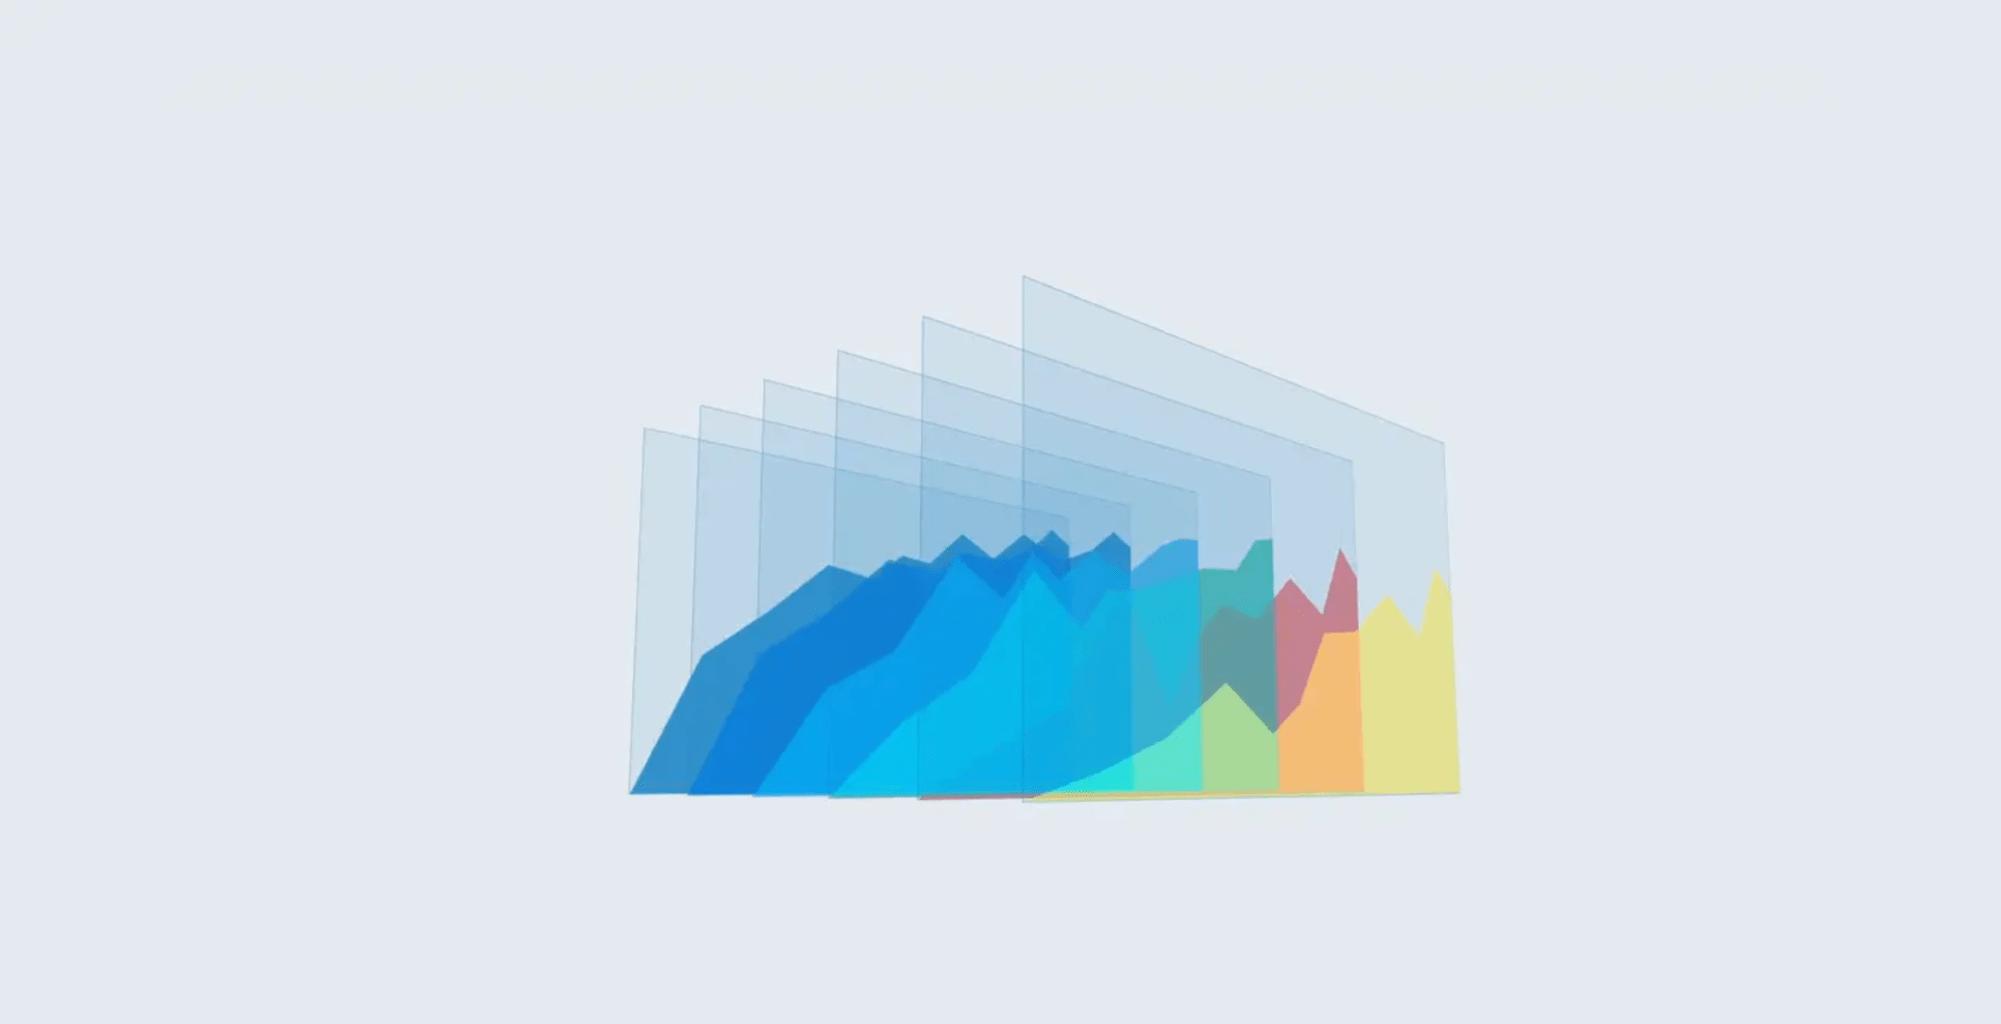 3d visual data